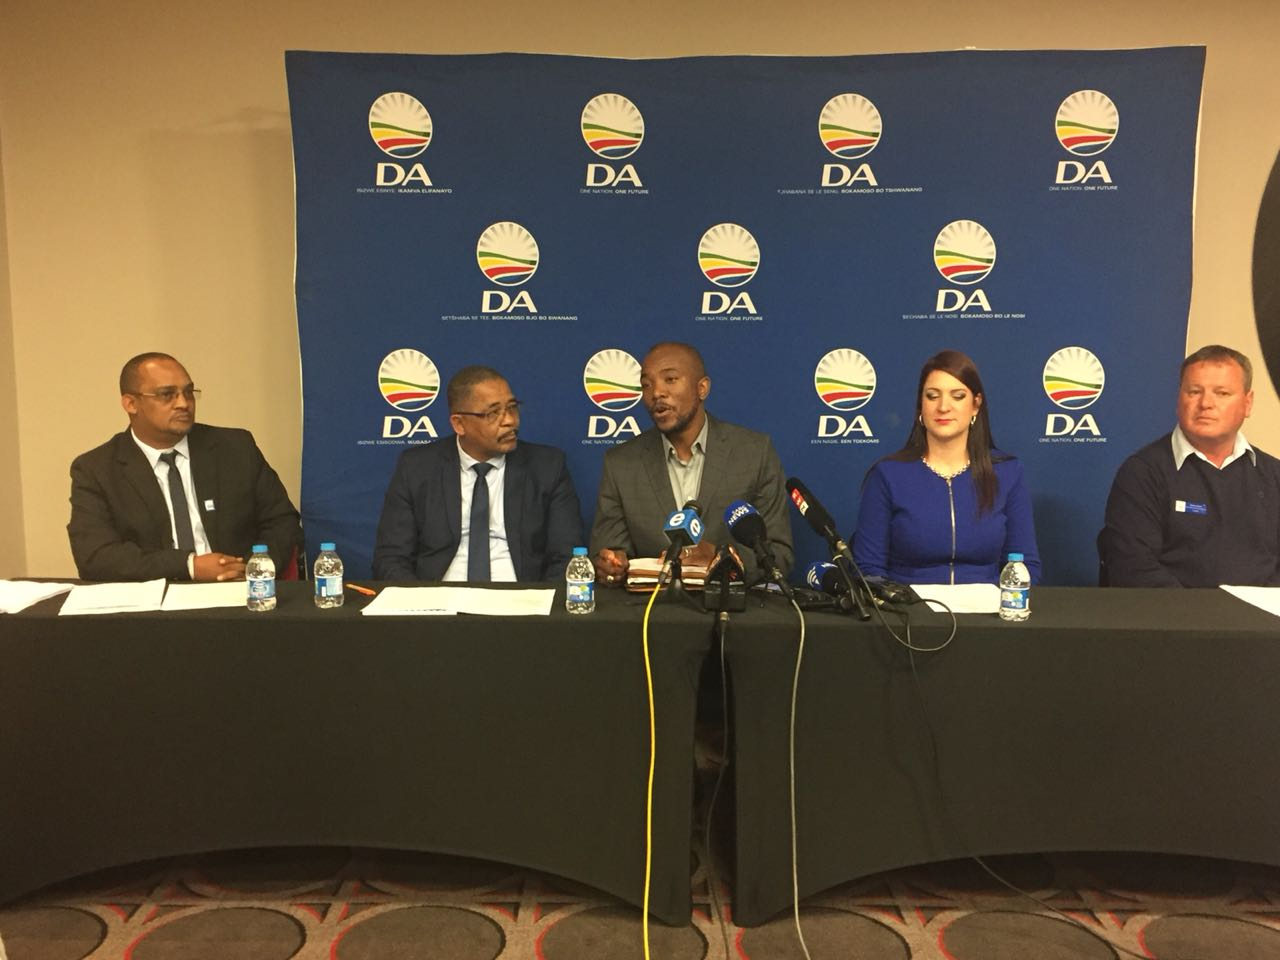 DA local municipalities celebrate two years in government